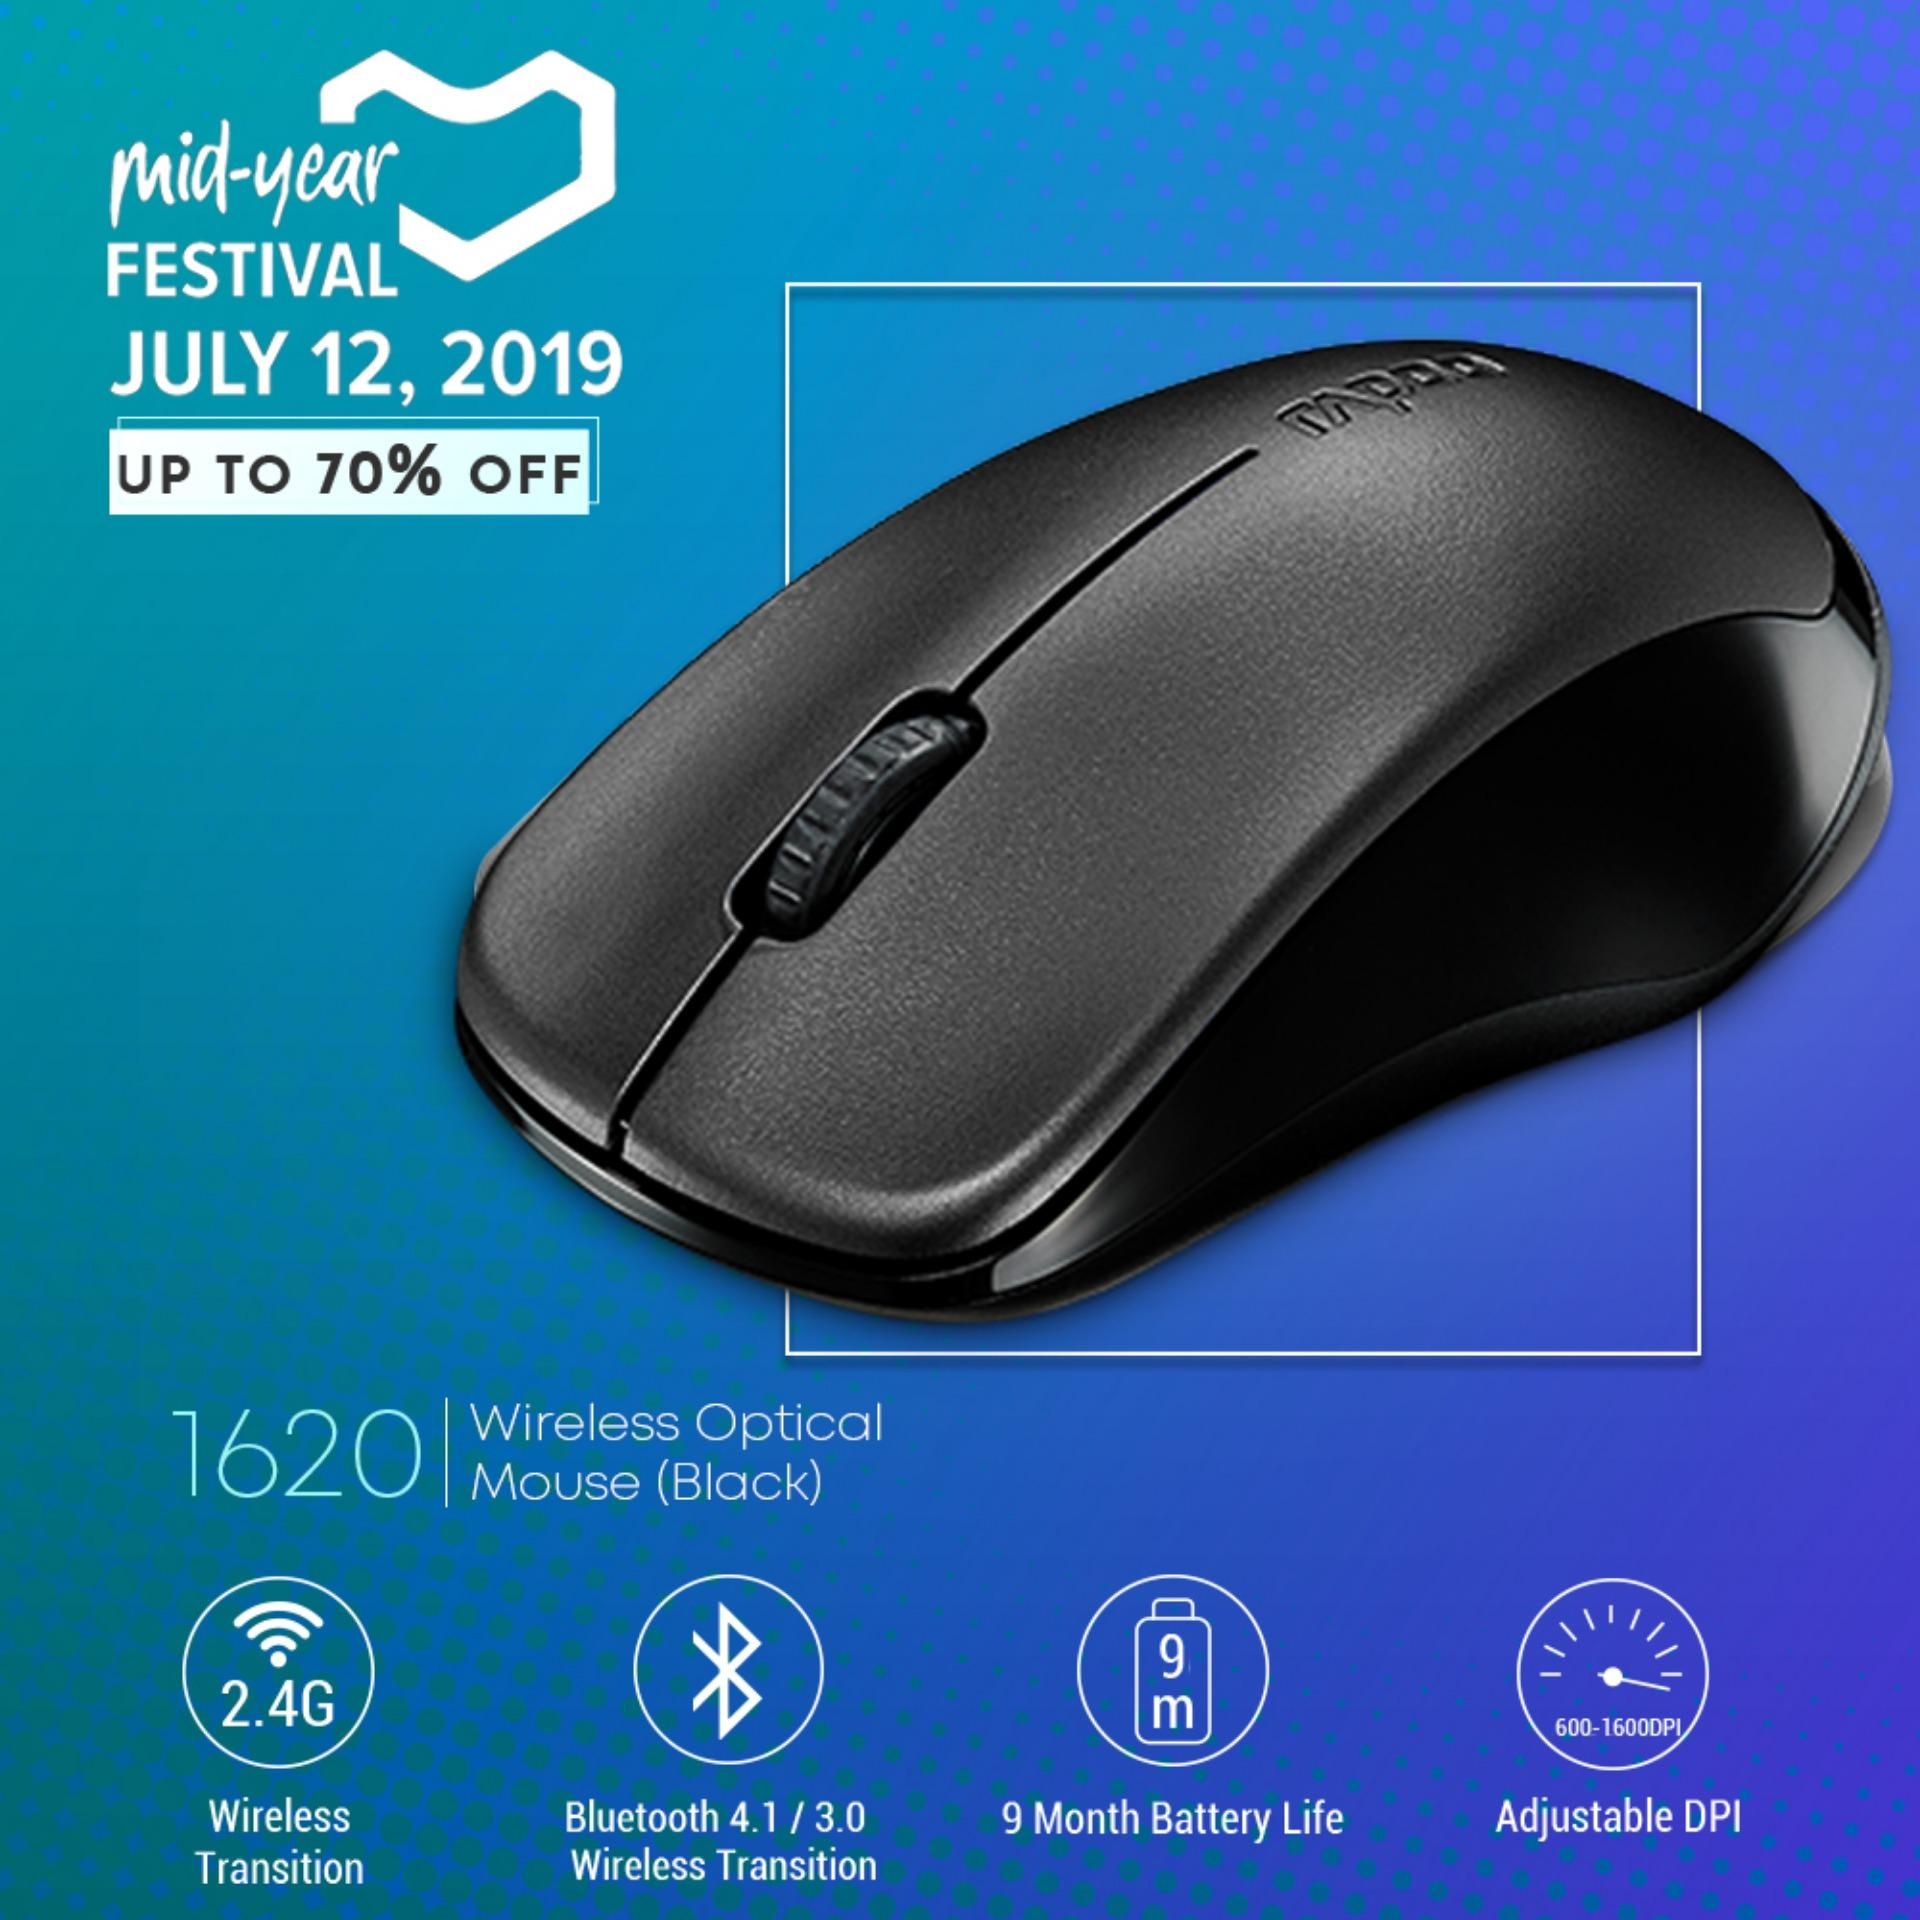 255af3fb6e4 Rapoo 1620 2.4G 10m Working Range DPI 1000 Wireless Entry Level Optical  Mouse